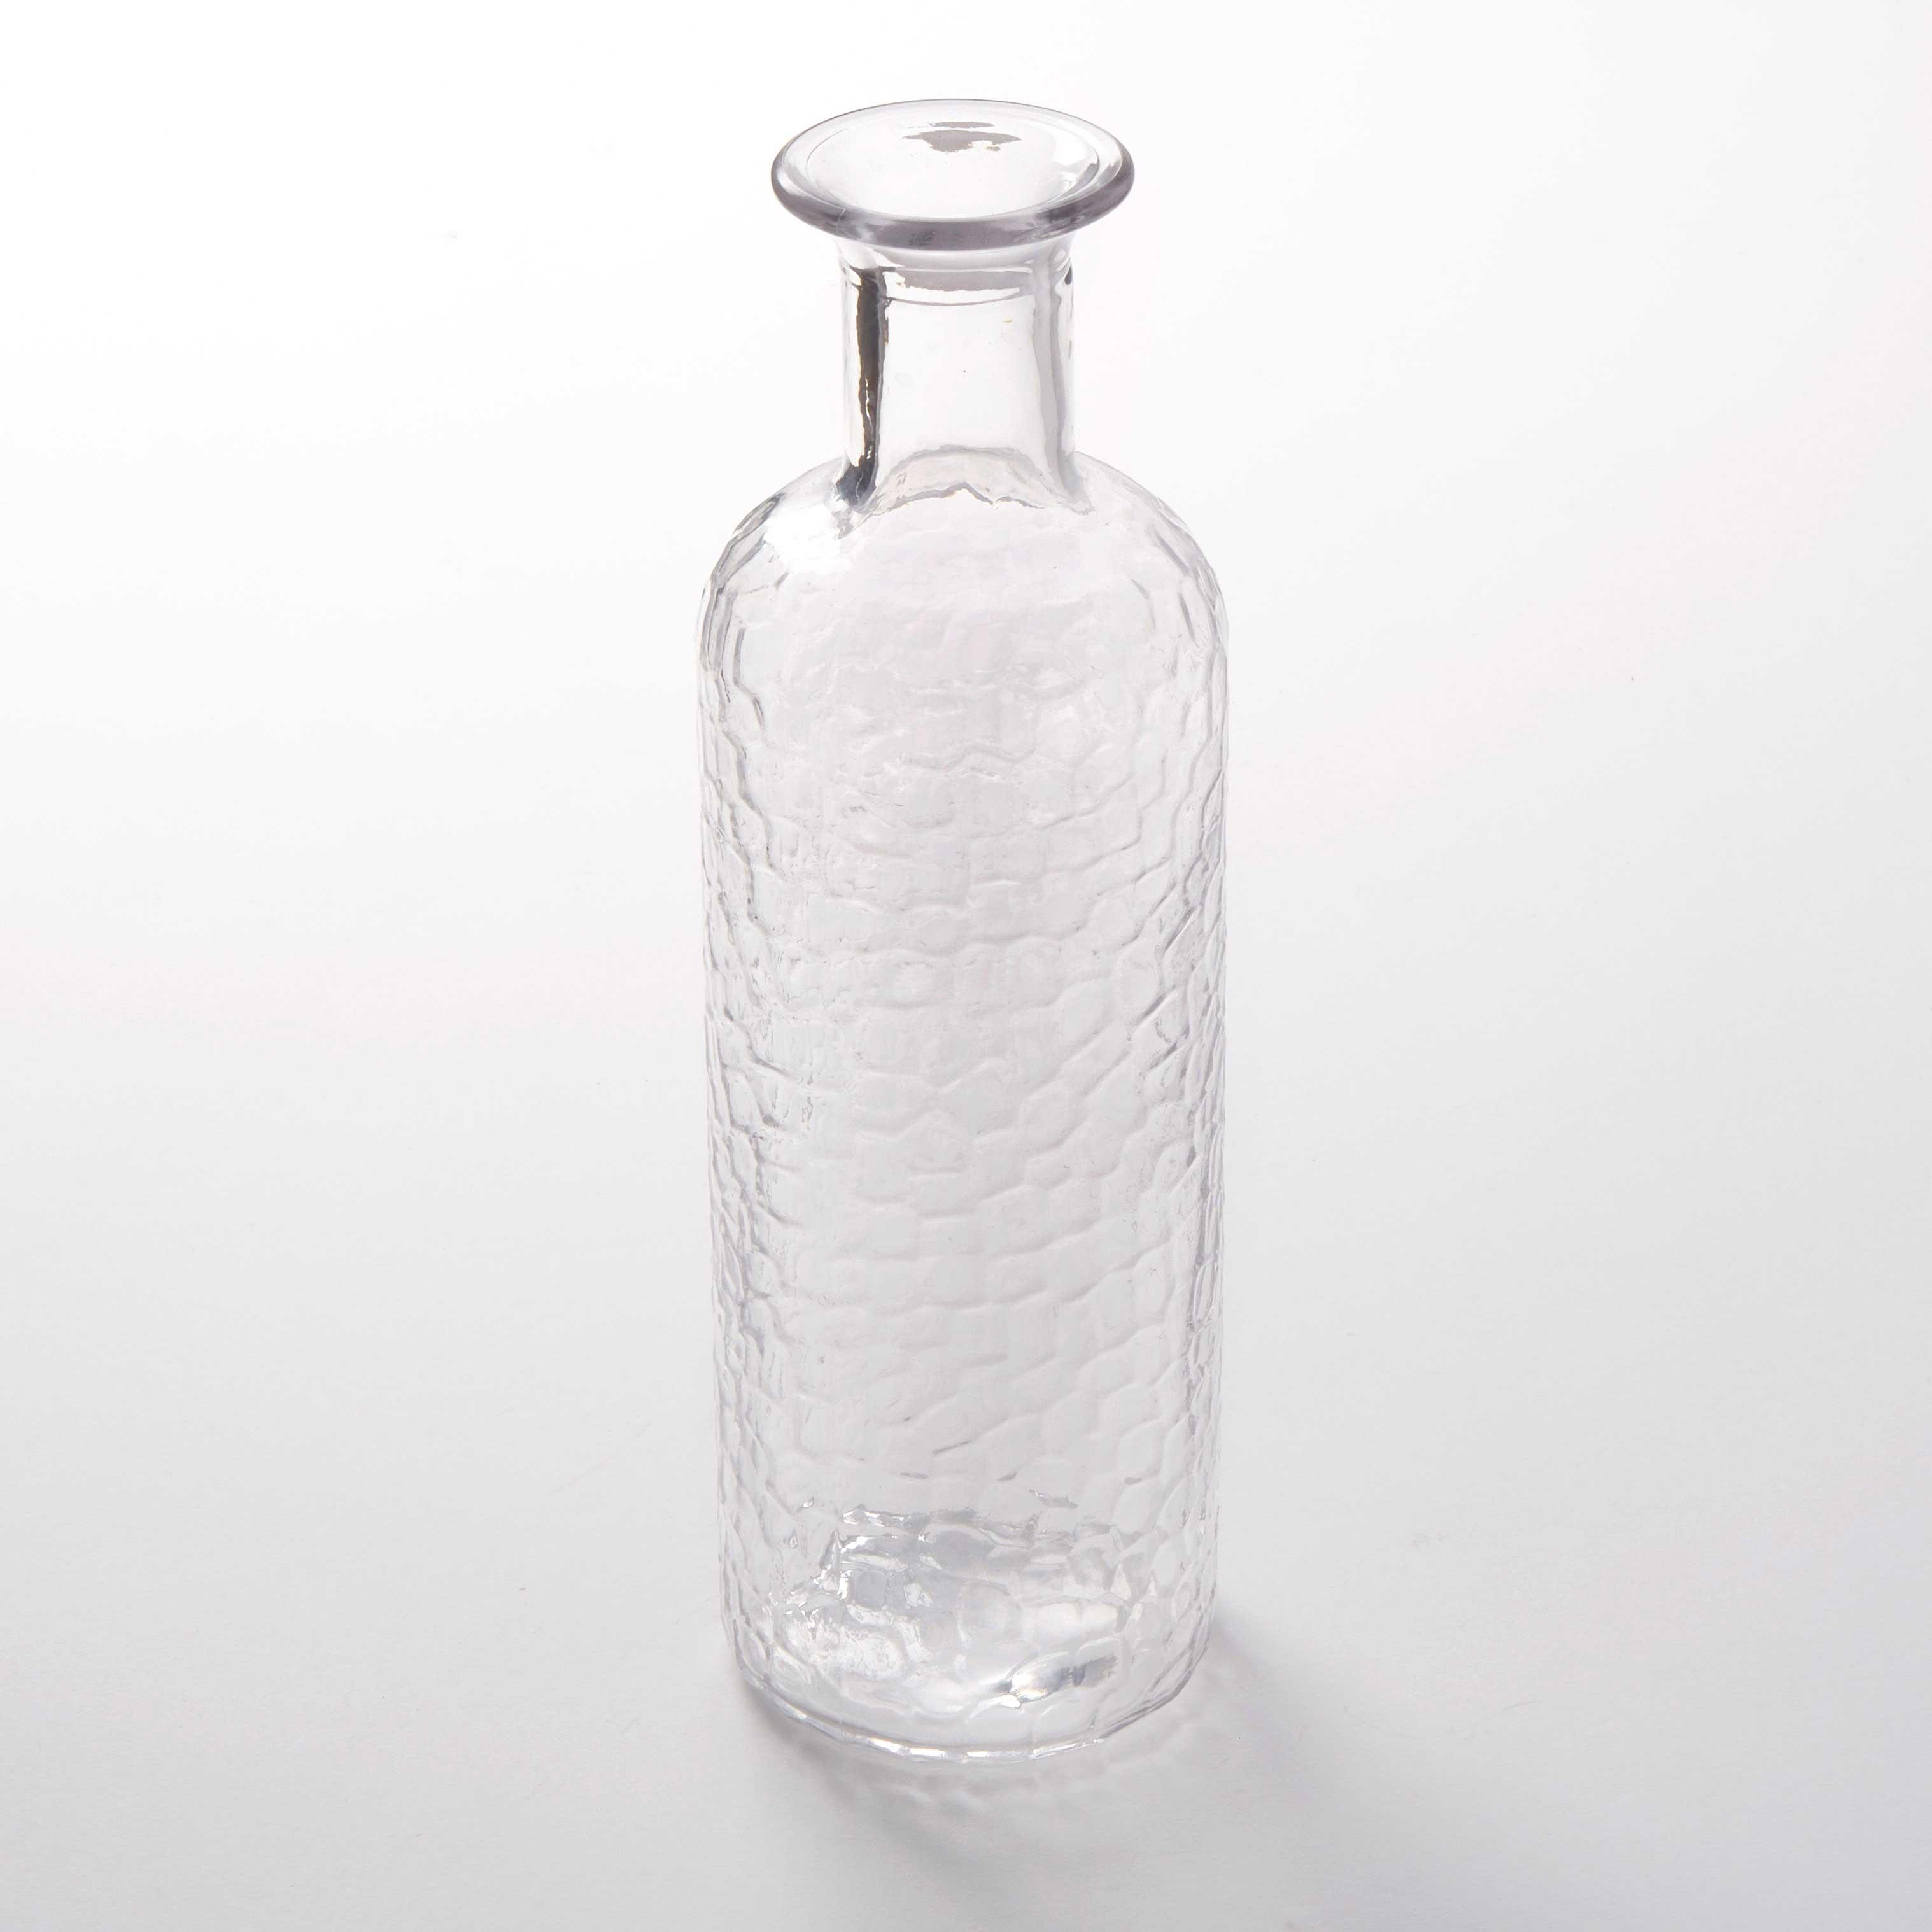 American Metalcraft GCH28 glass, bottle